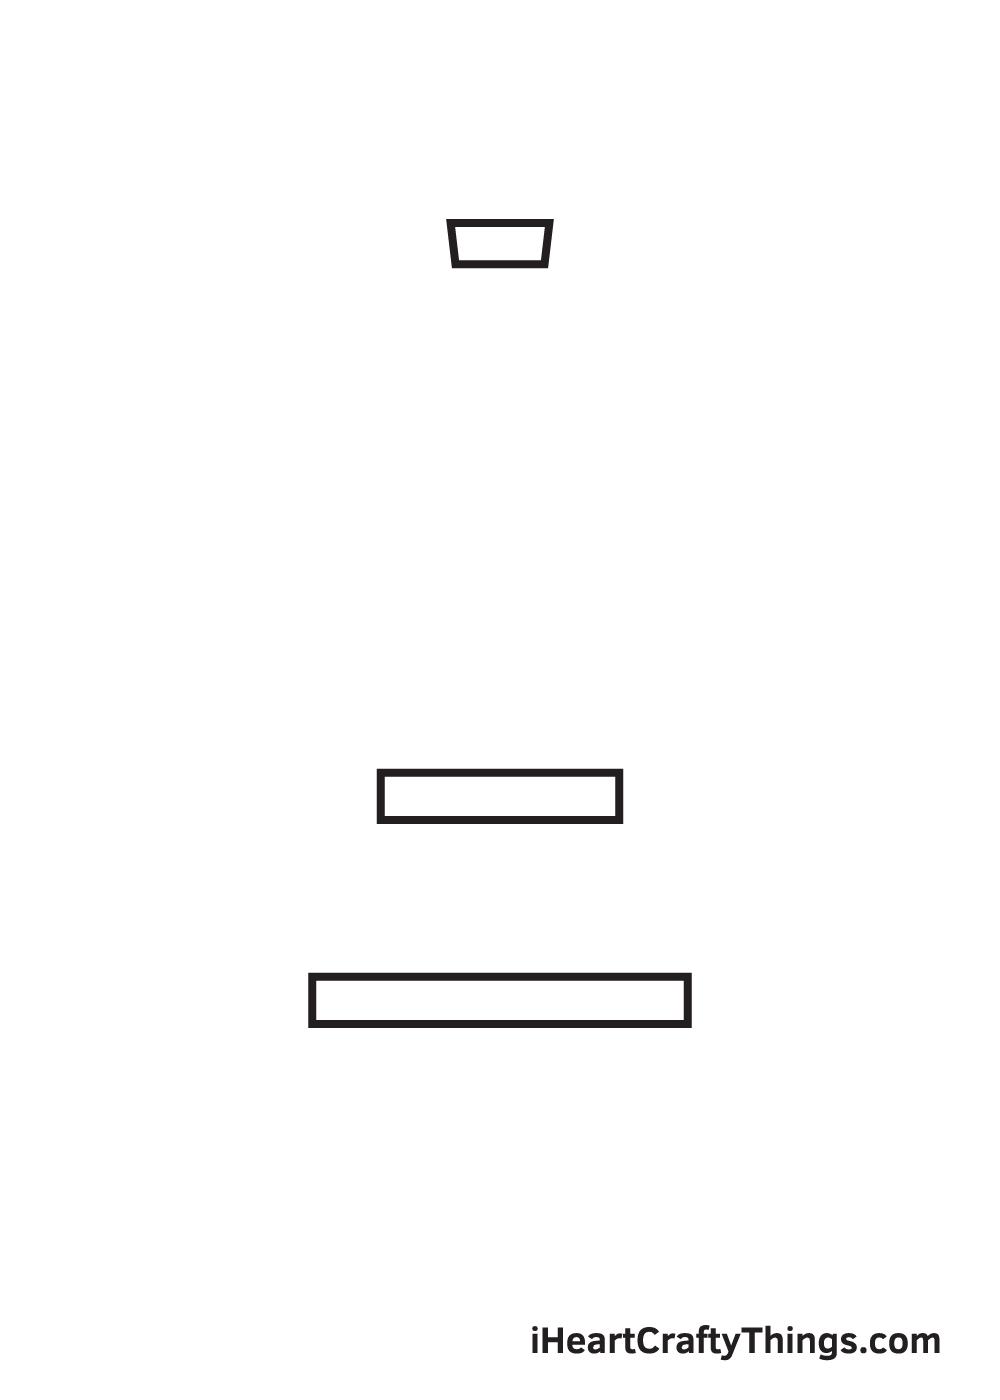 eiffel tower drawing - step 1